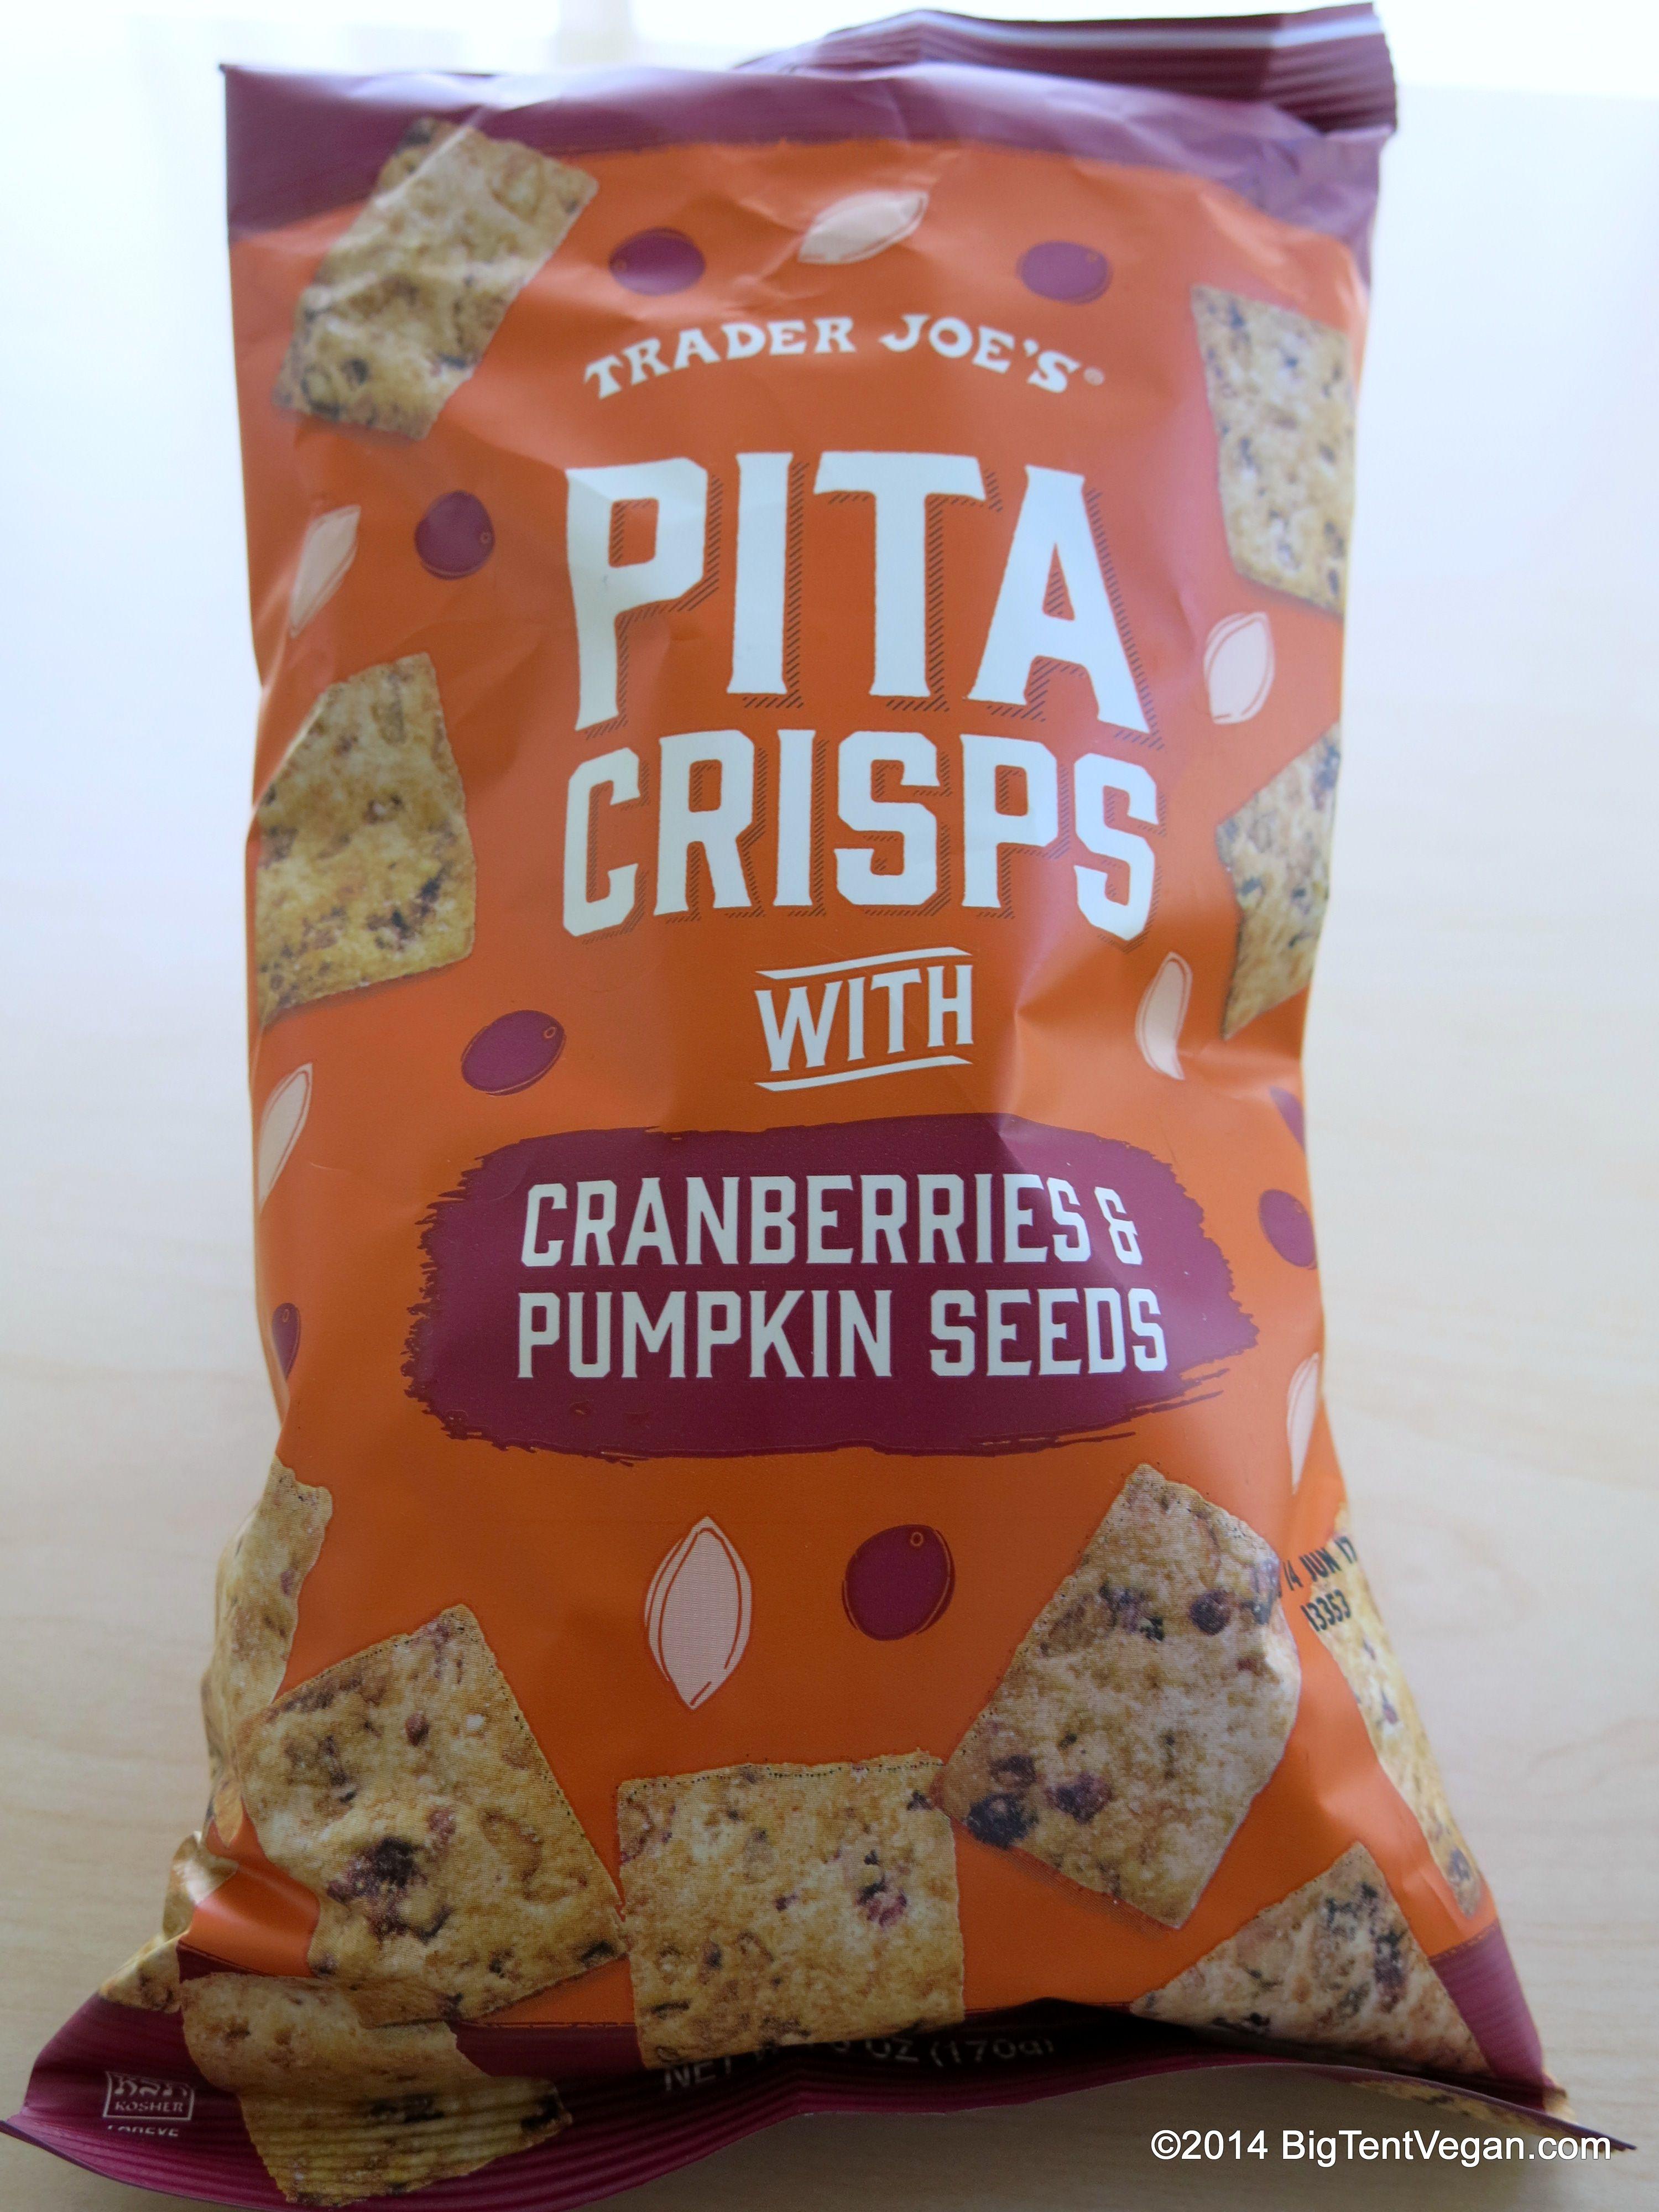 Pita Crisps with Cranberries & Pumpkin Seeds